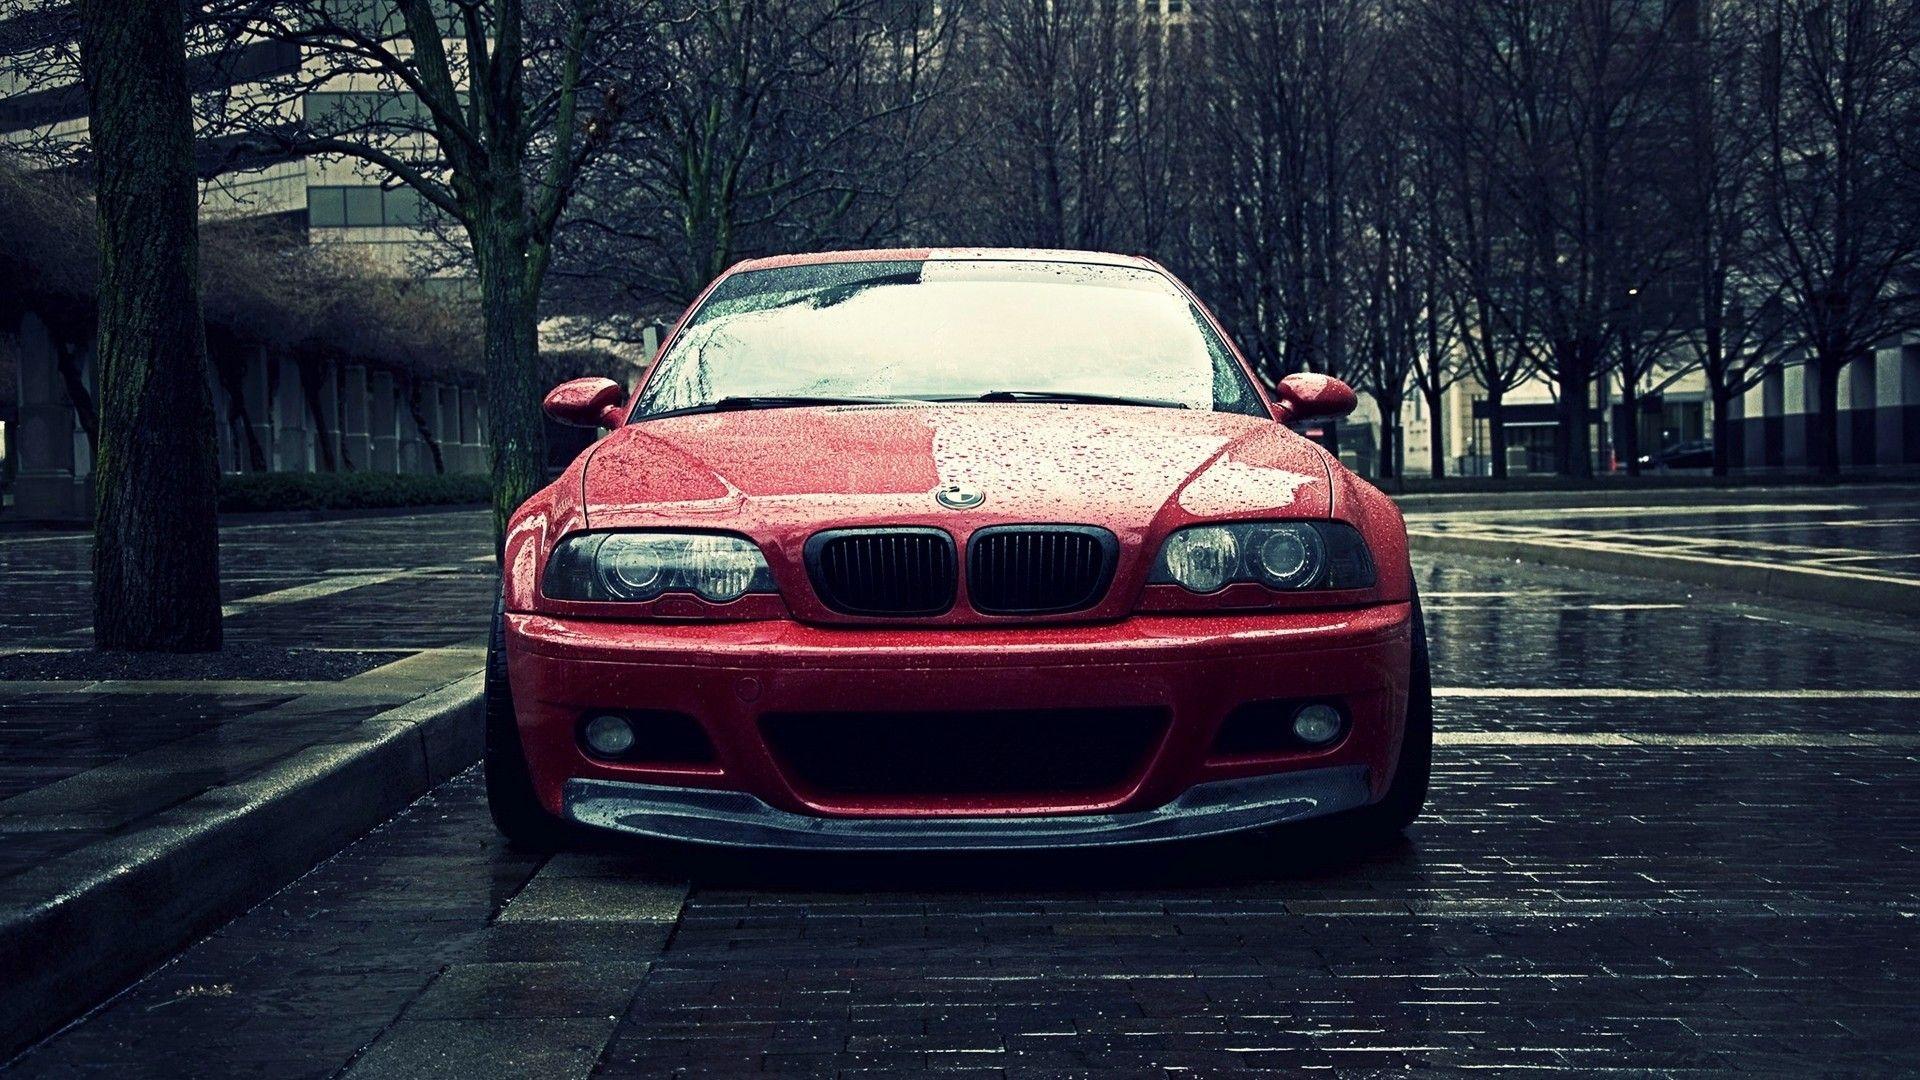 Bmw E46 M3 Rainy Evening Reddit Credit Zaar1911 Cars